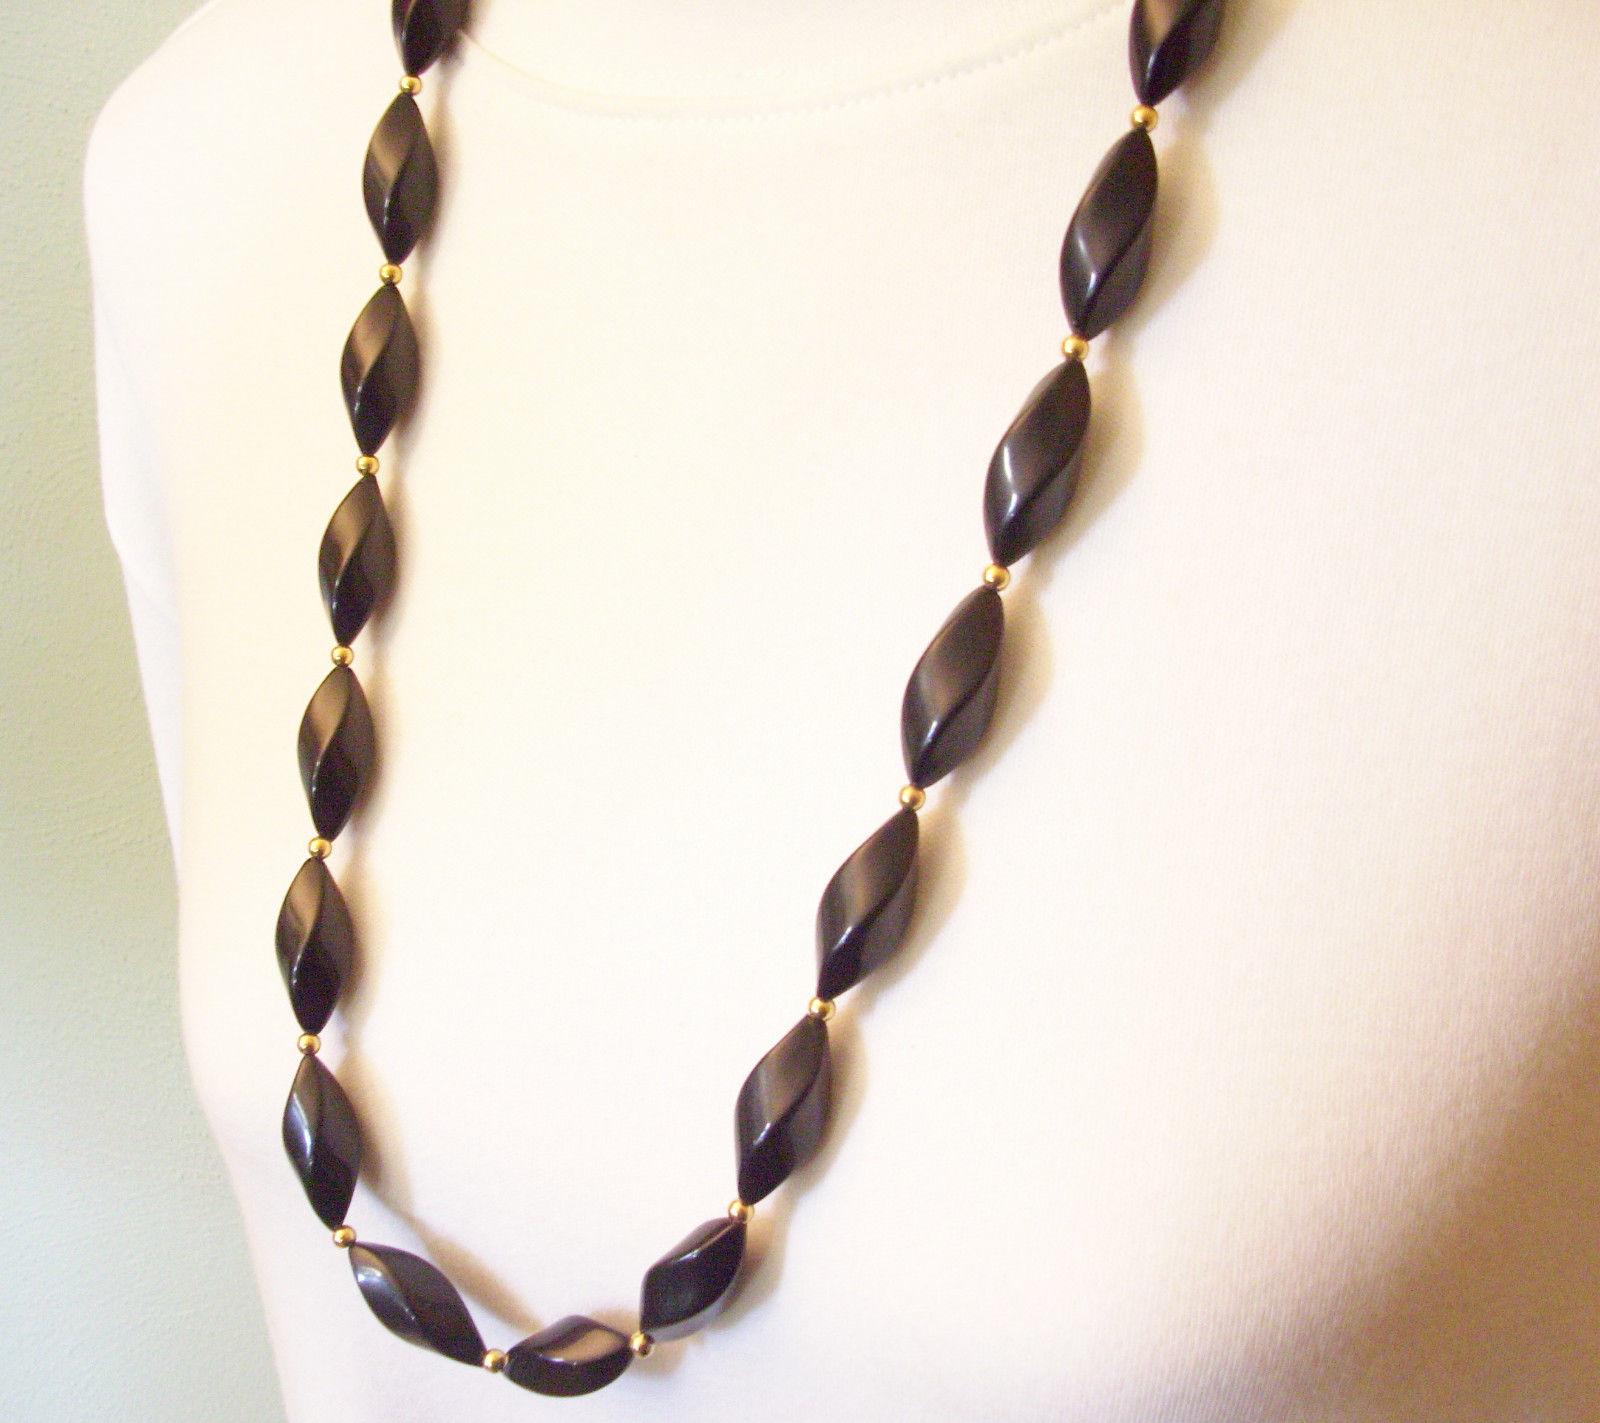 "NAPIER Jet BLACK Oval Twist Beads Strand Necklace Gold Spacers 32"" Vintage"